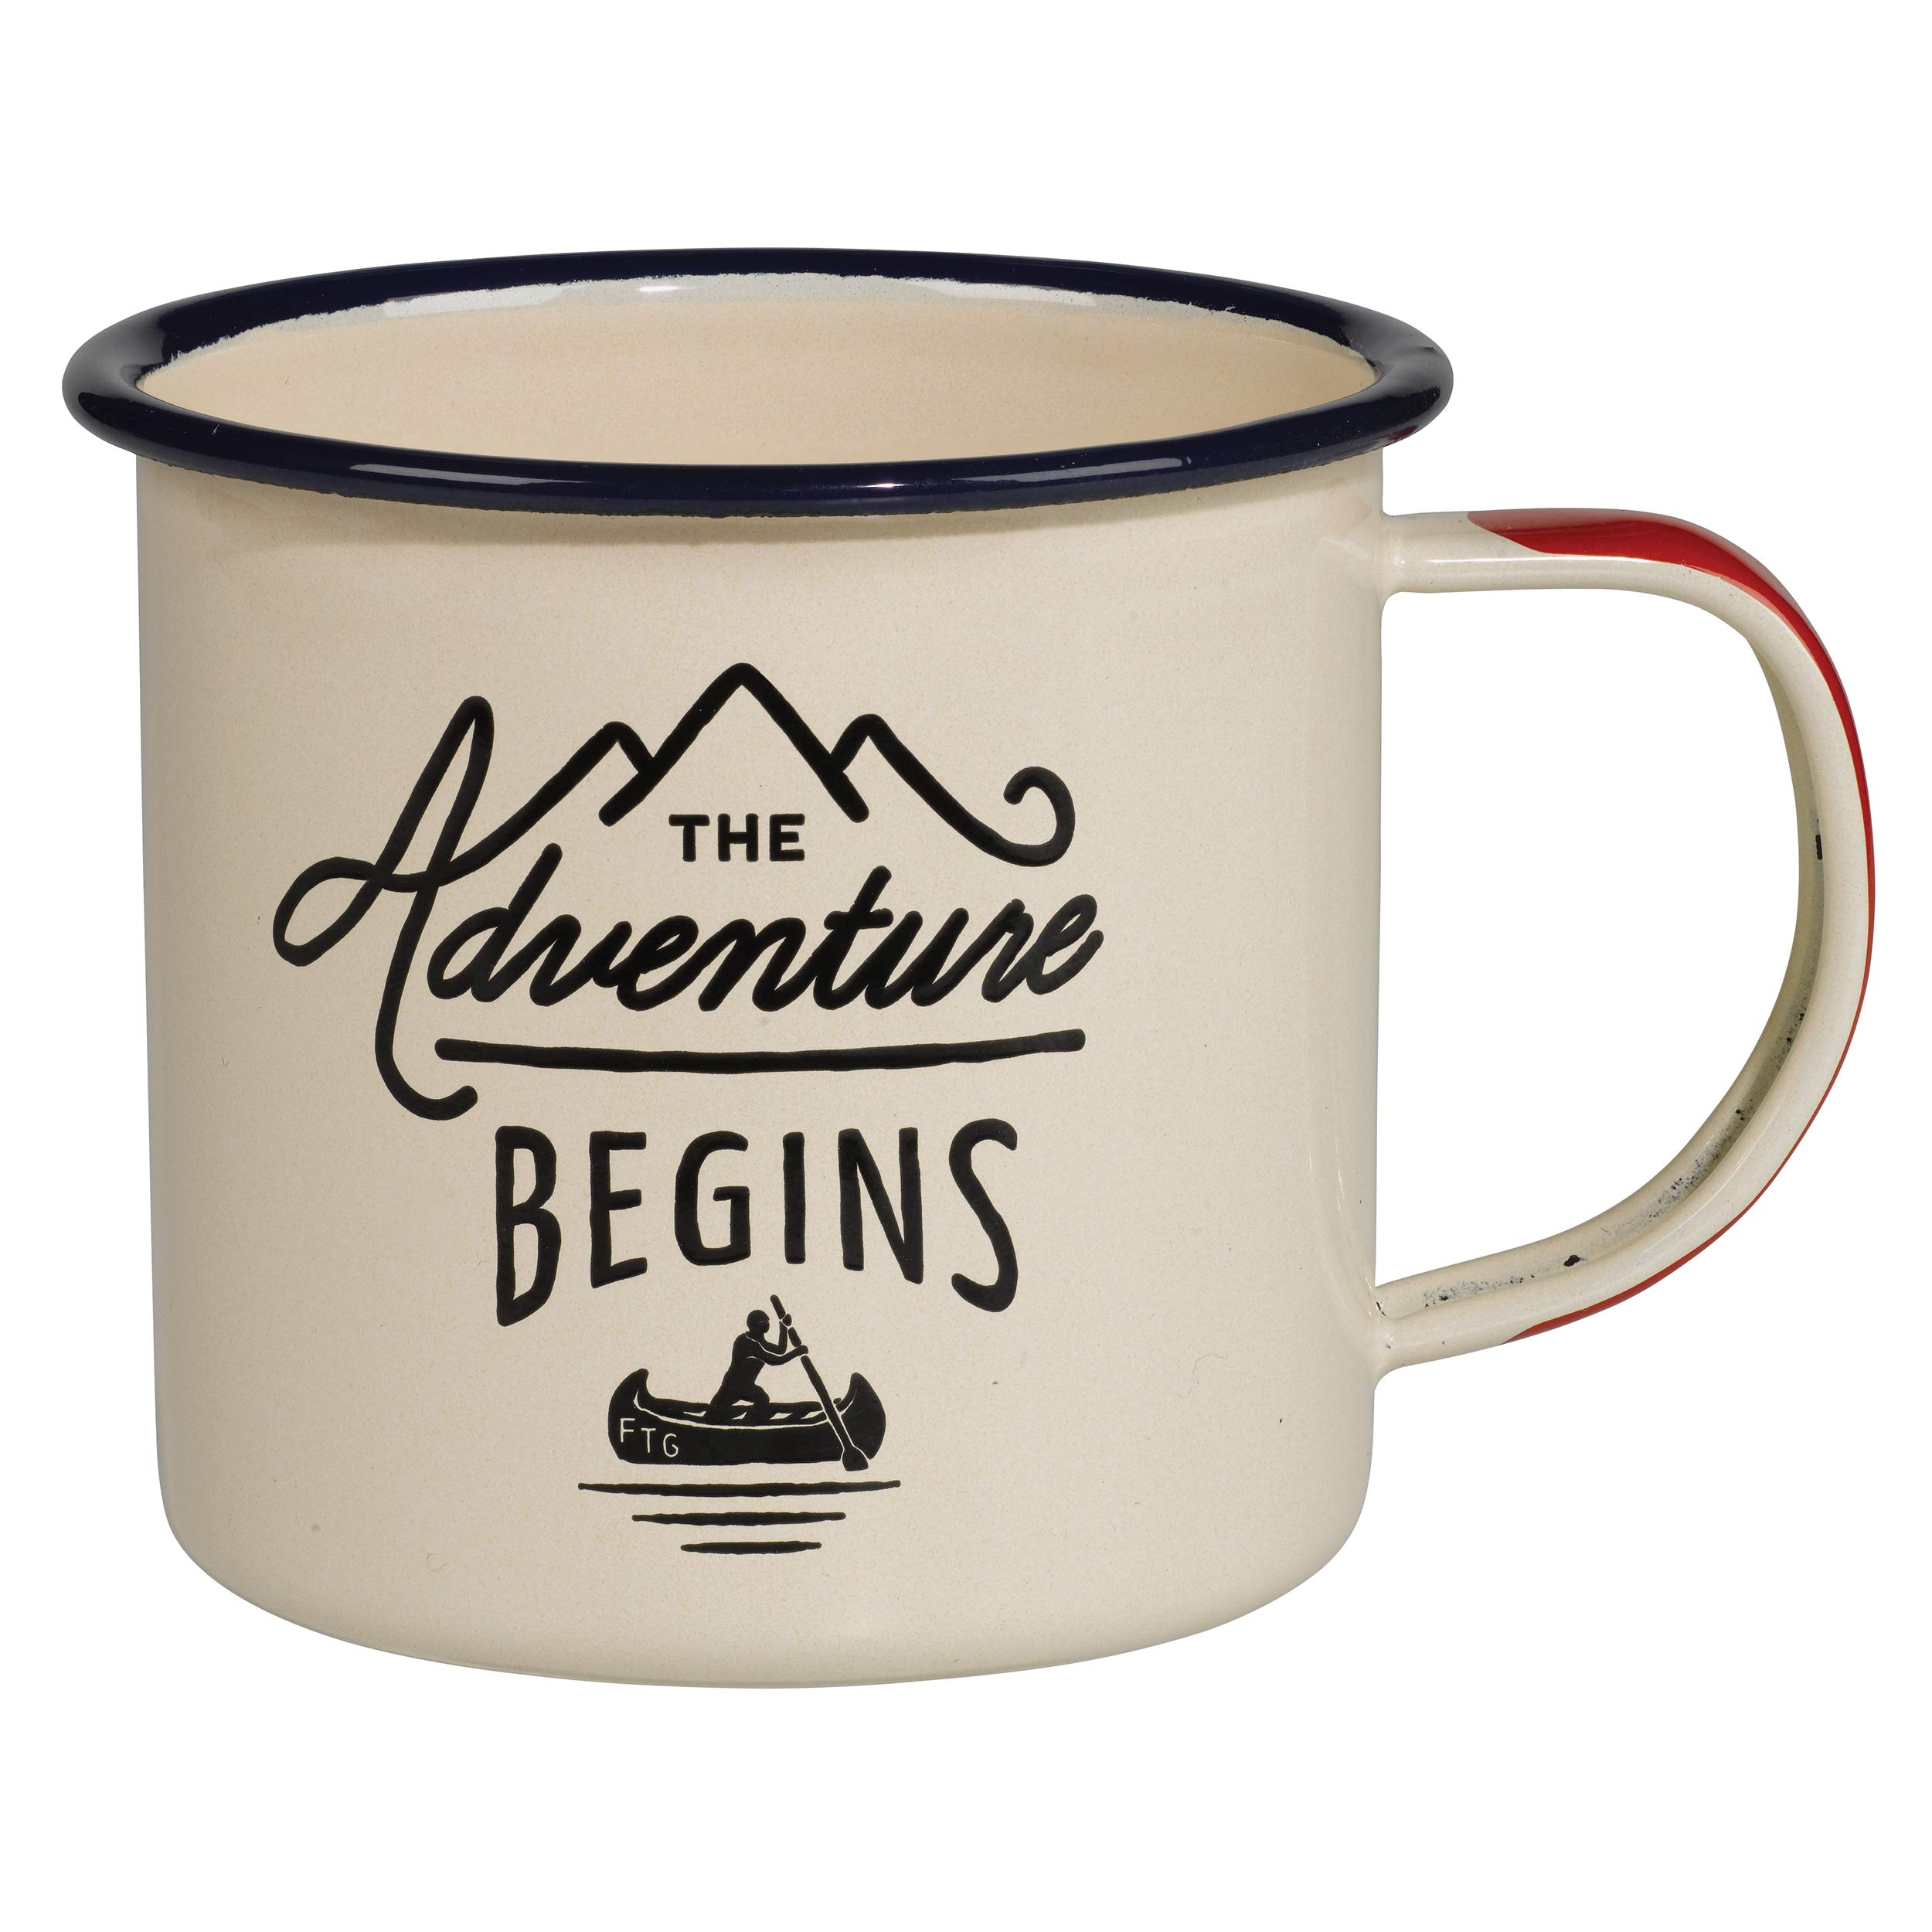 Gentlemen's Hardware Adventure Enamel Camping Coffee Mug, Cream (12 oz)